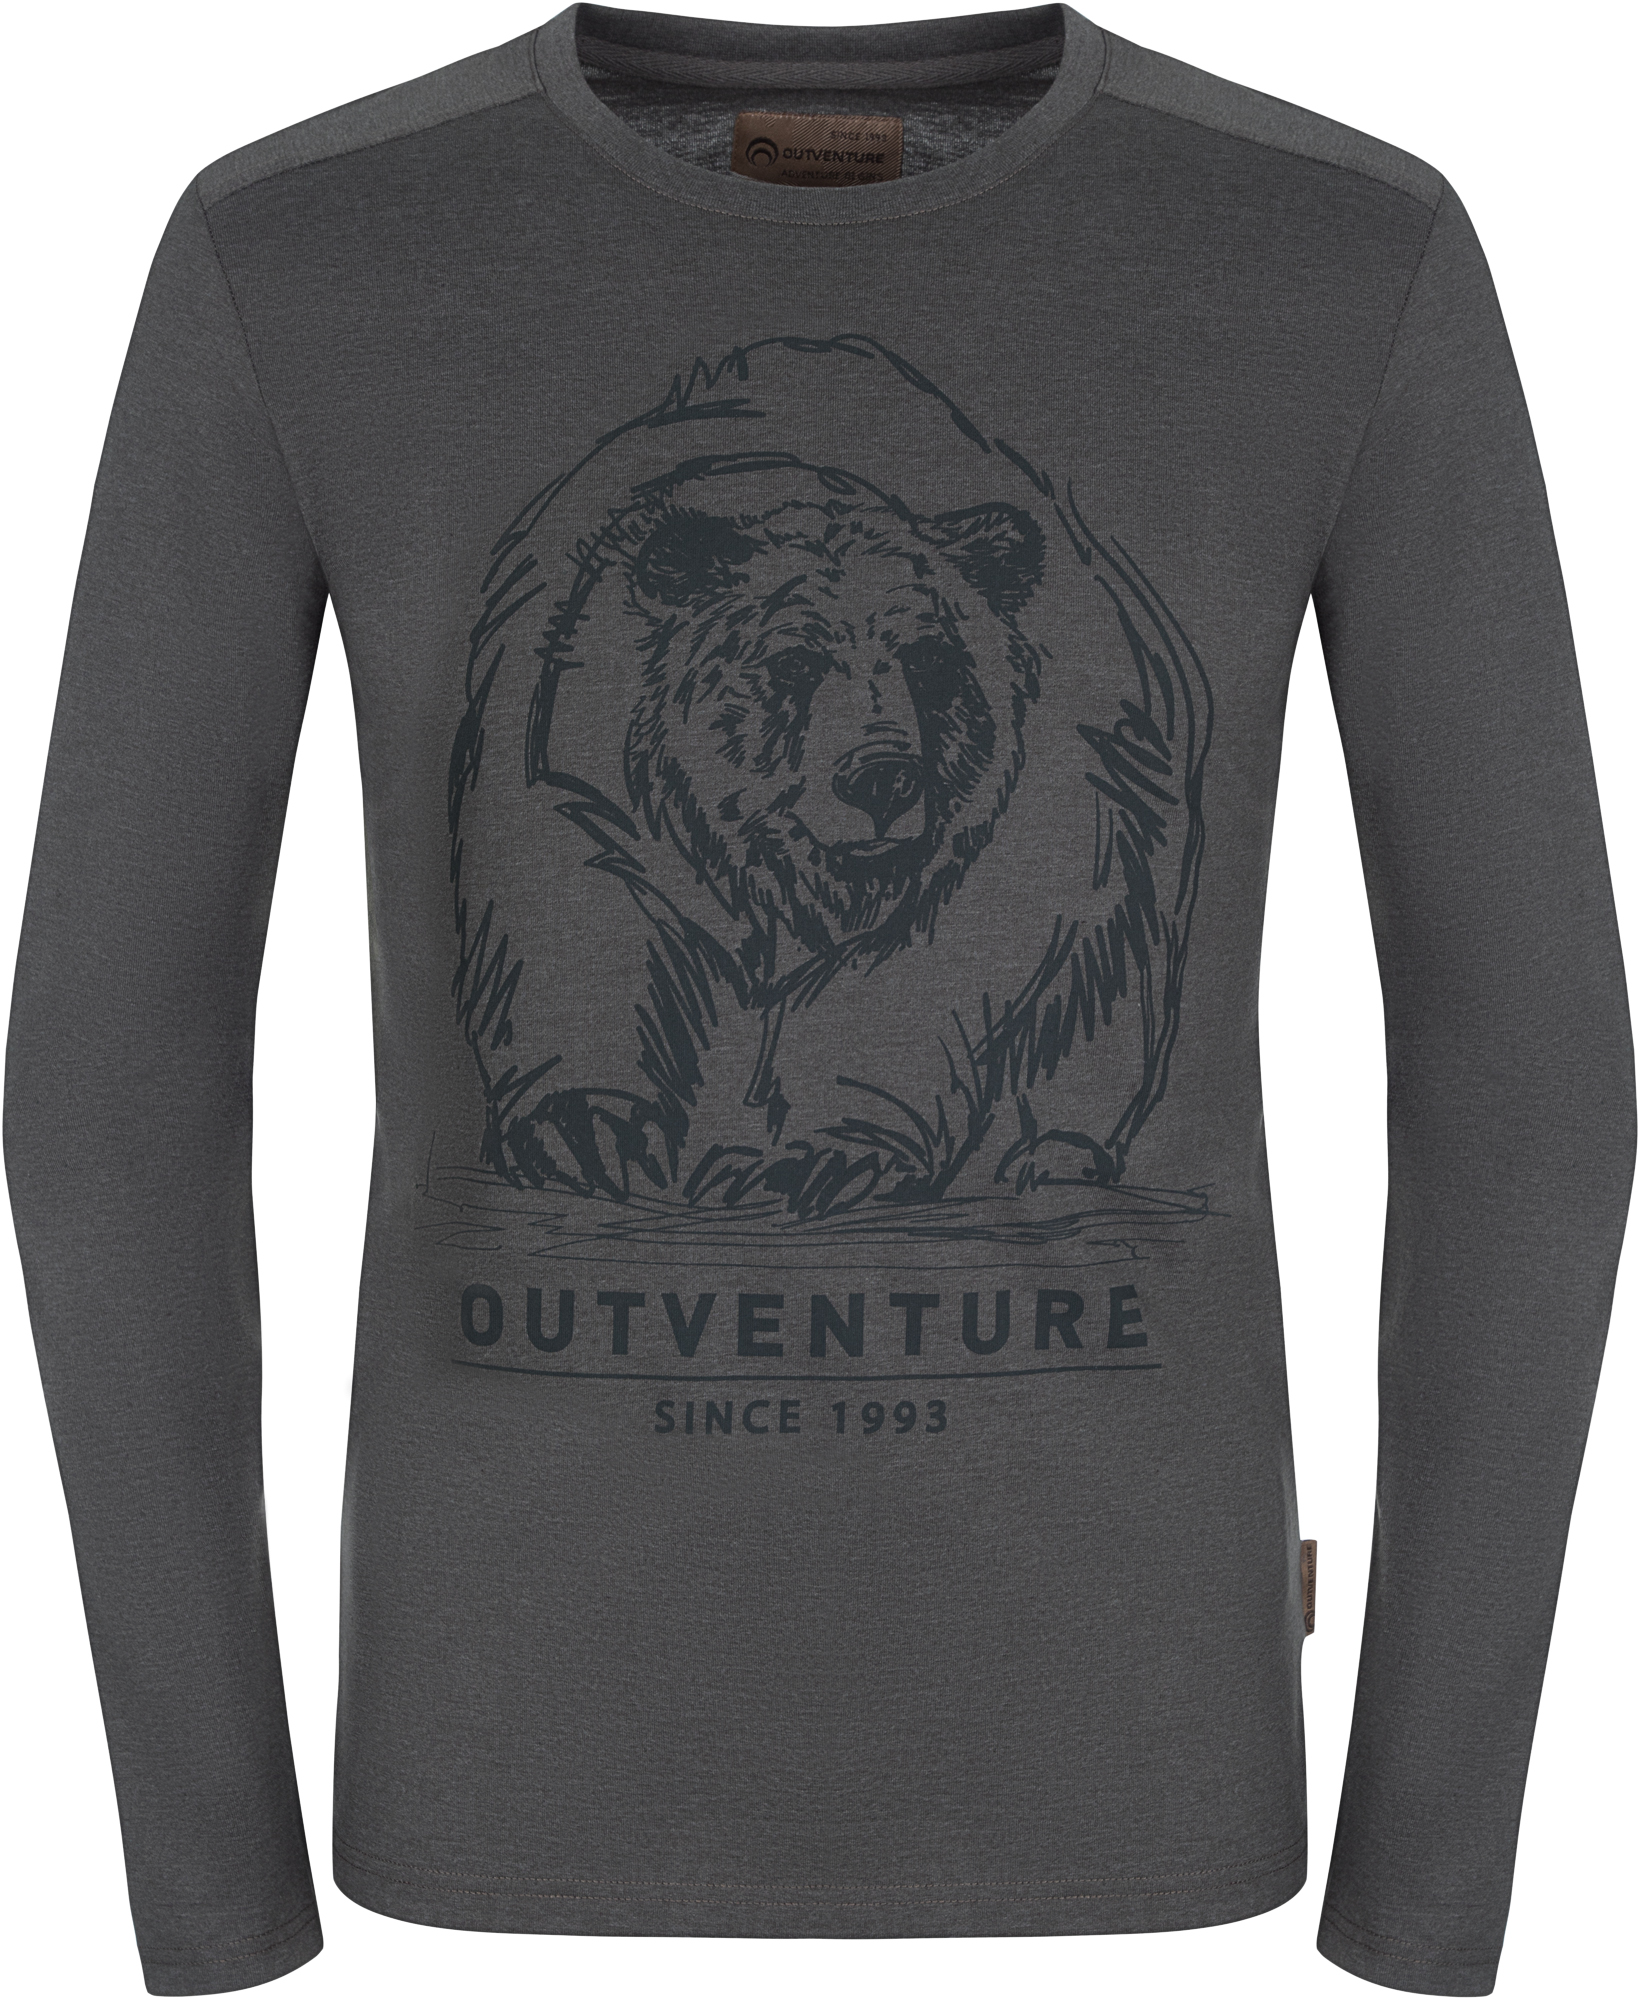 Outventure Лонгслив мужской Outventure, размер 48 лонгслив мужской oodji basic цвет серый 5b511002m 46737n 2300m размер s 46 48